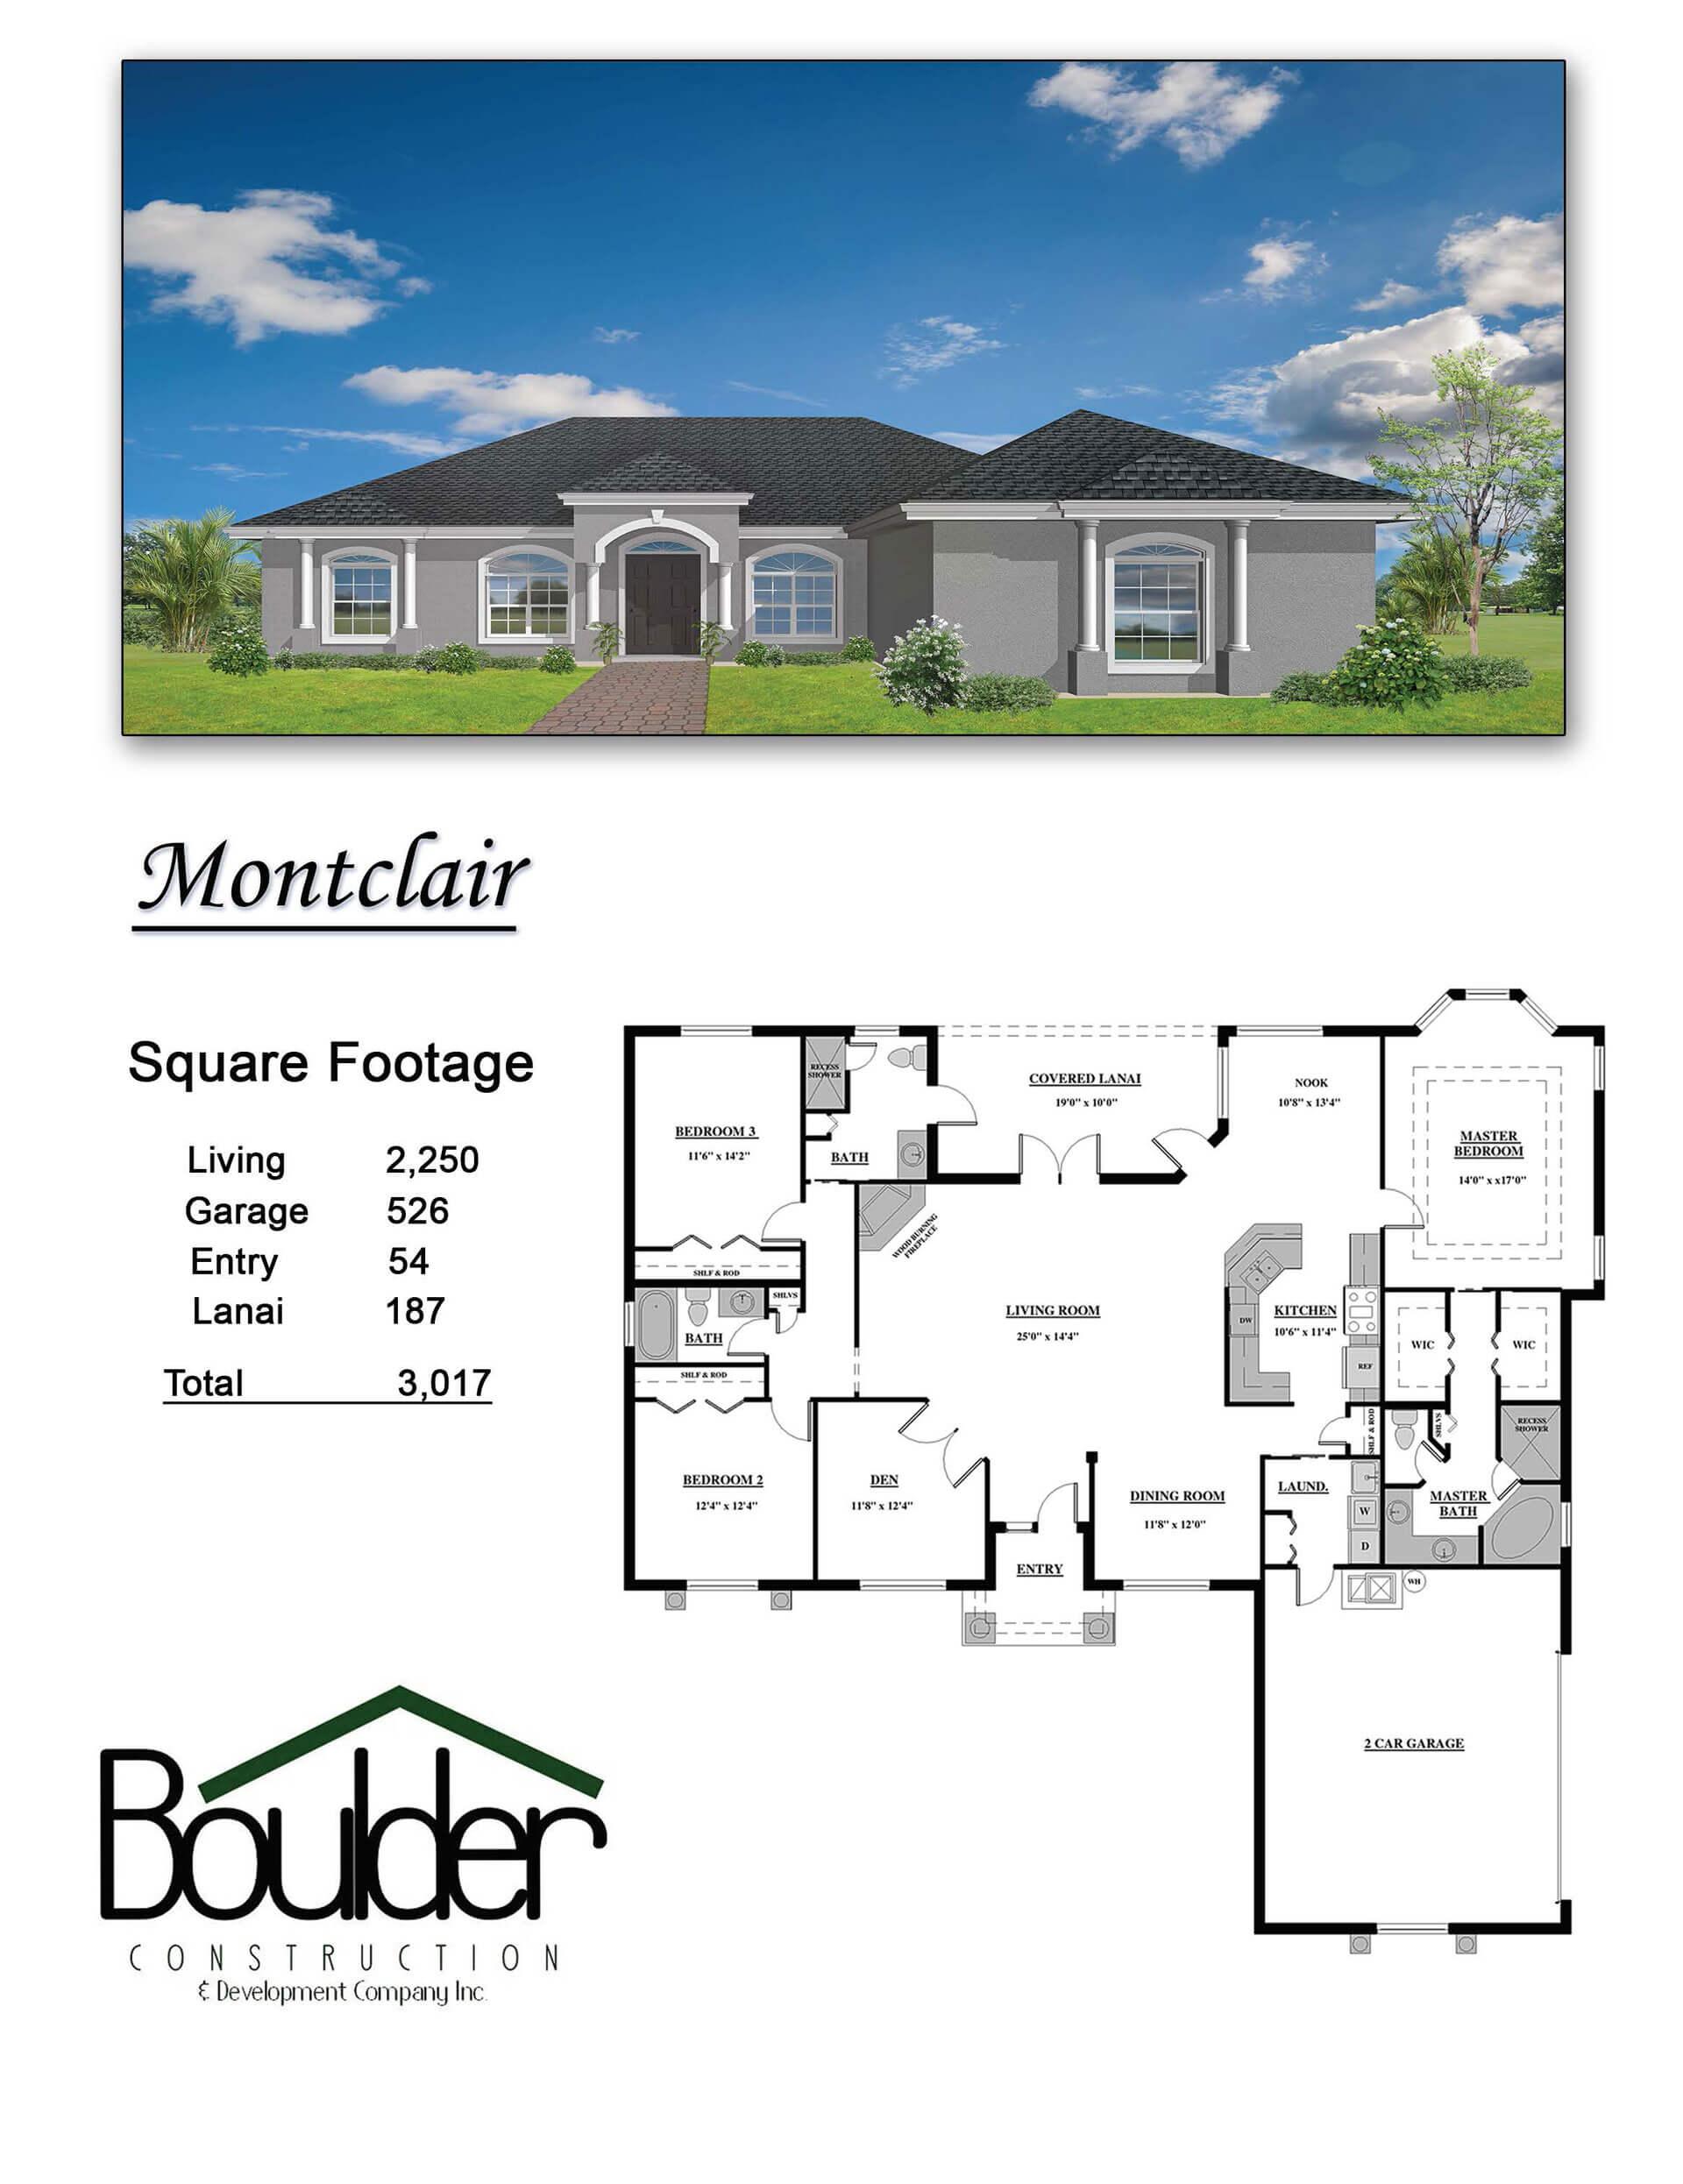 boulder-construction-montclair-floor-plan